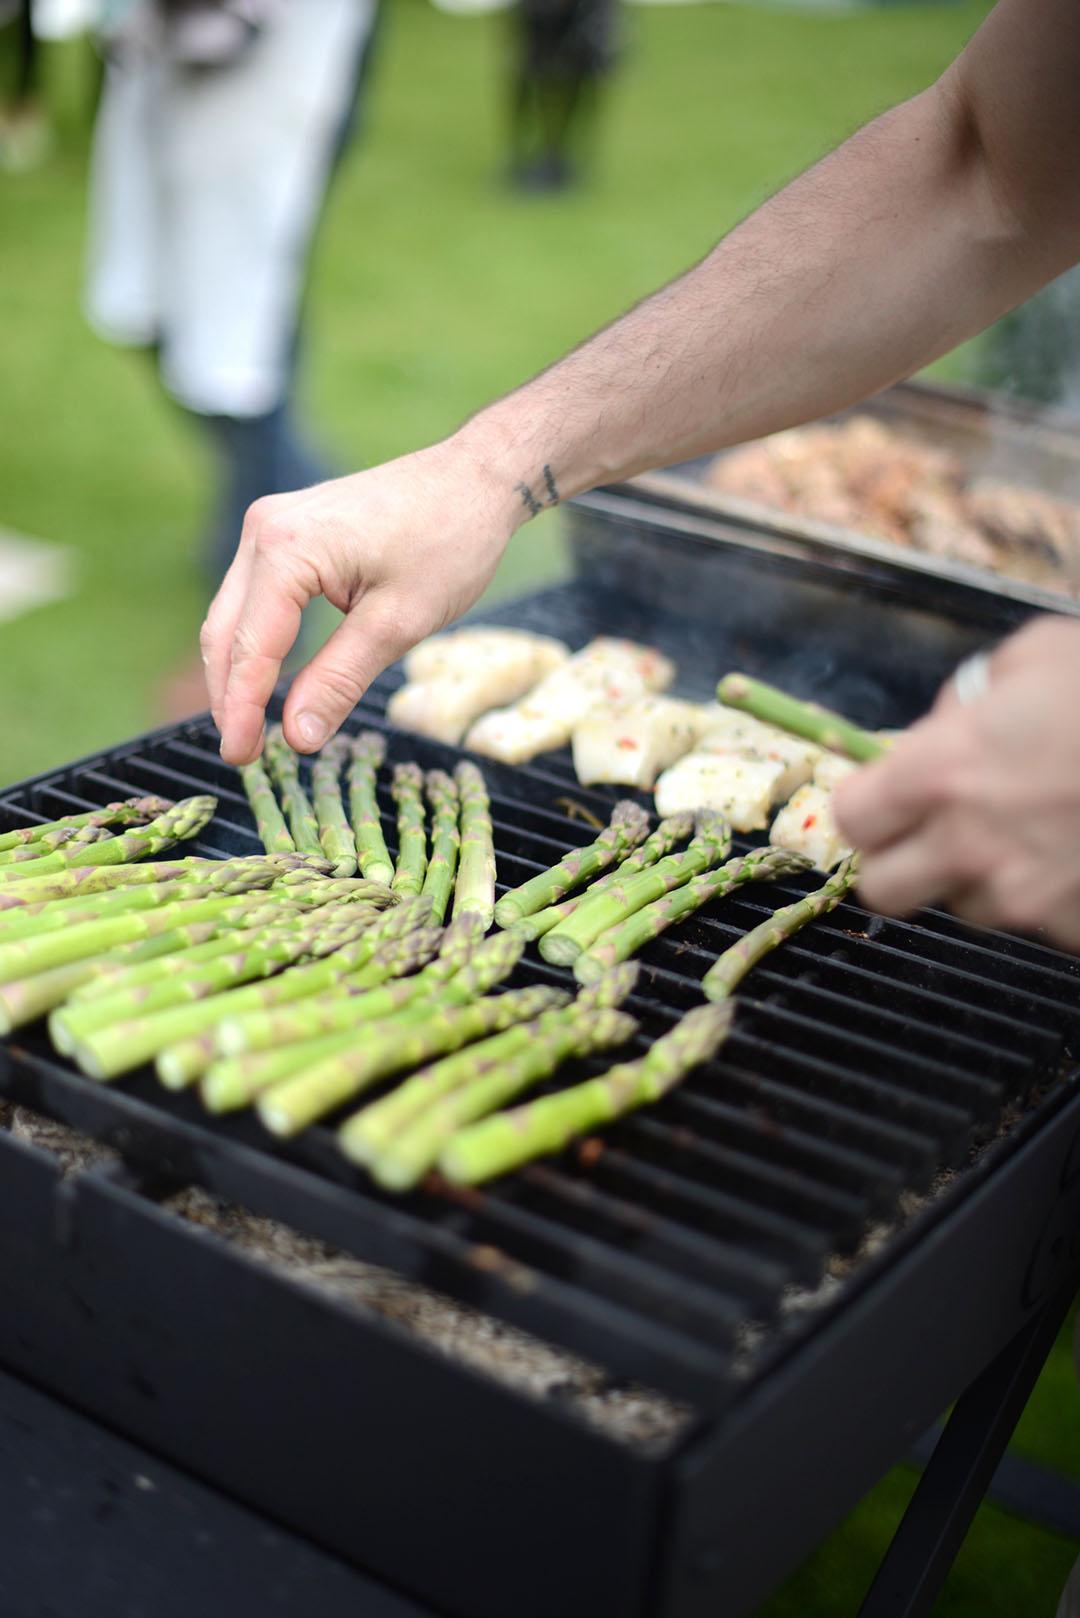 tim maddams summer barbecue tips photographed by sara delaney